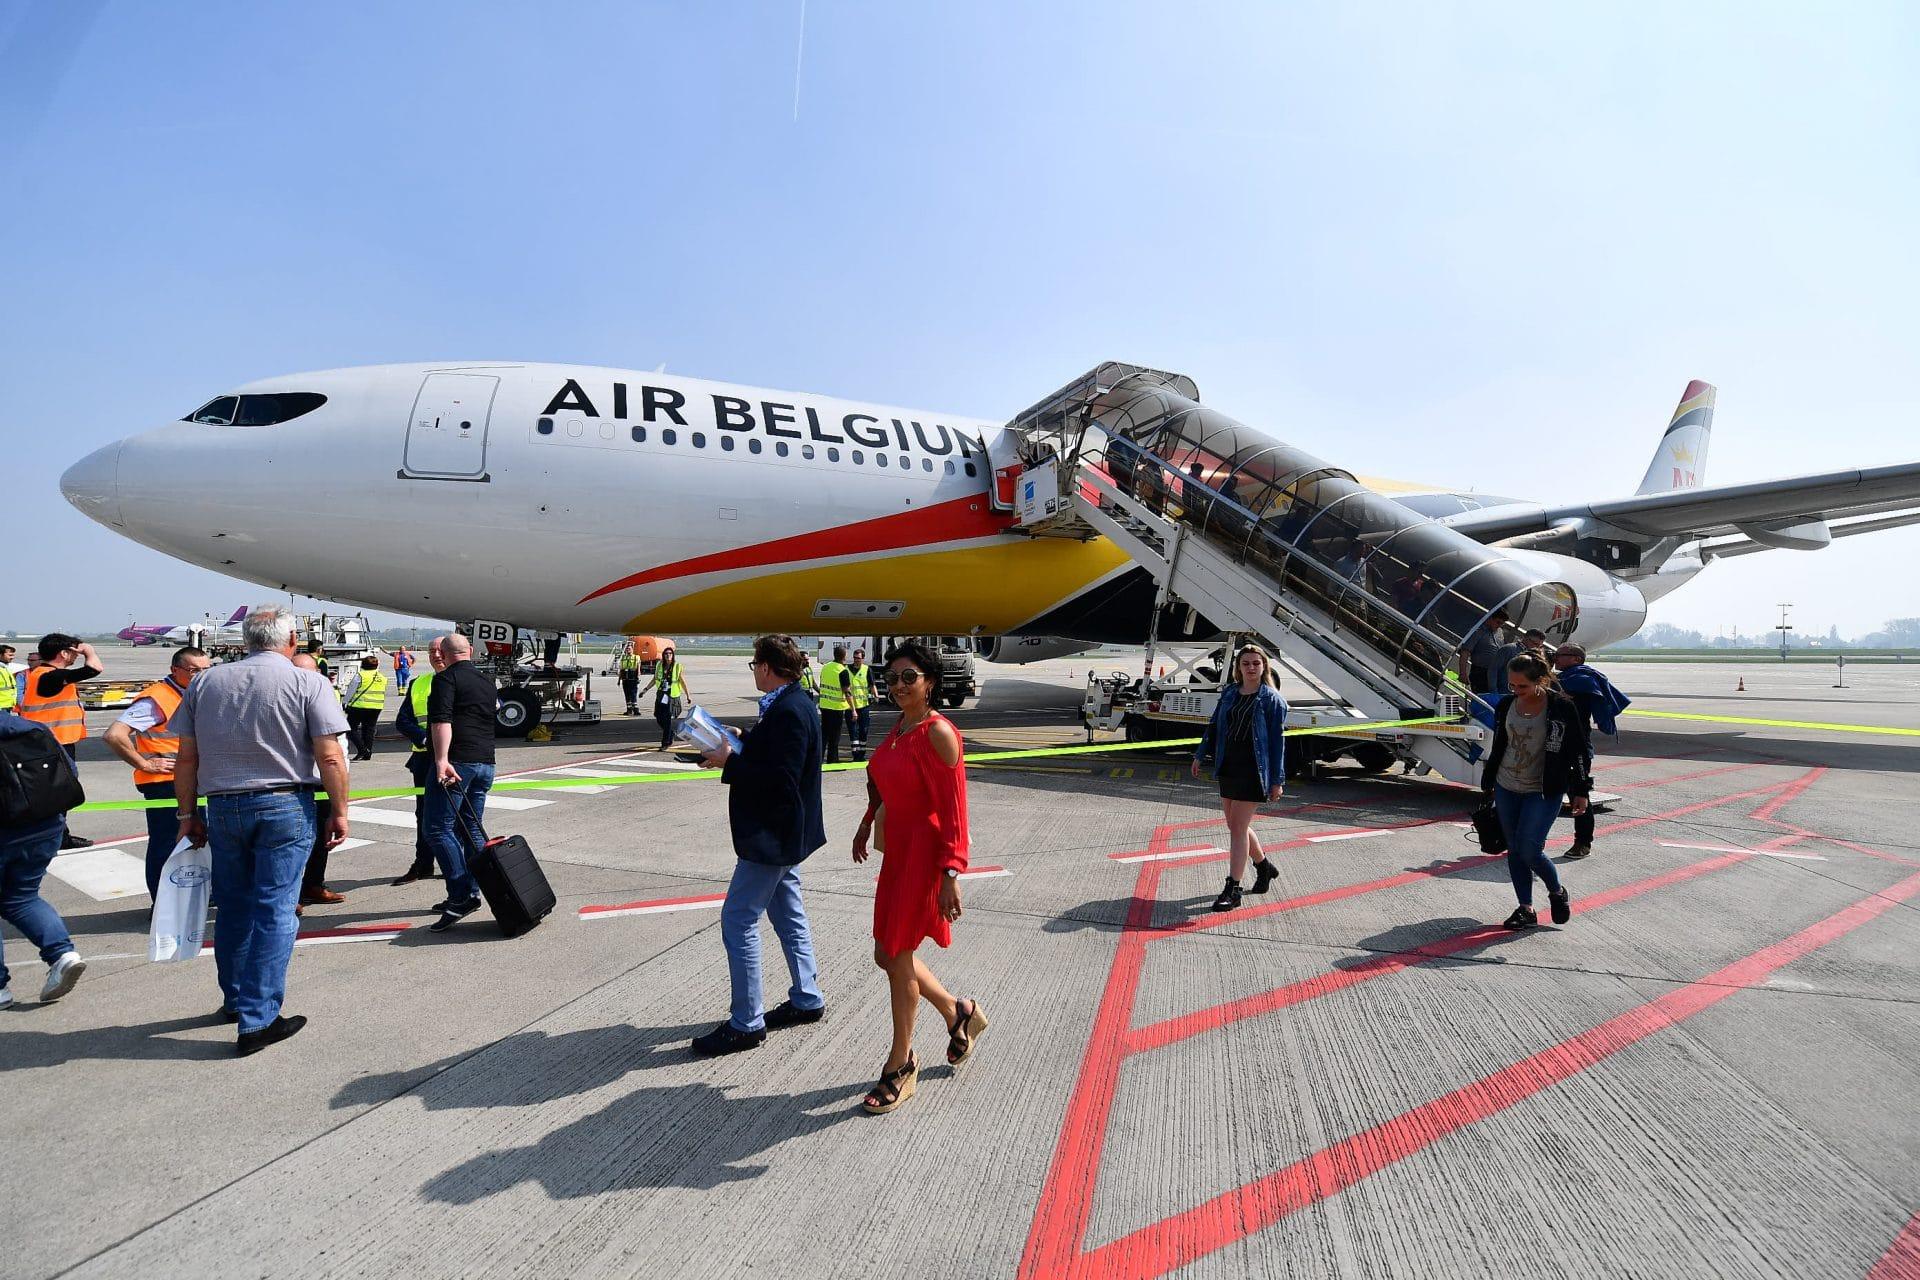 Aeroporto Guangzhou Arrive : Air belgium celebrates inaugural flight from brussels south